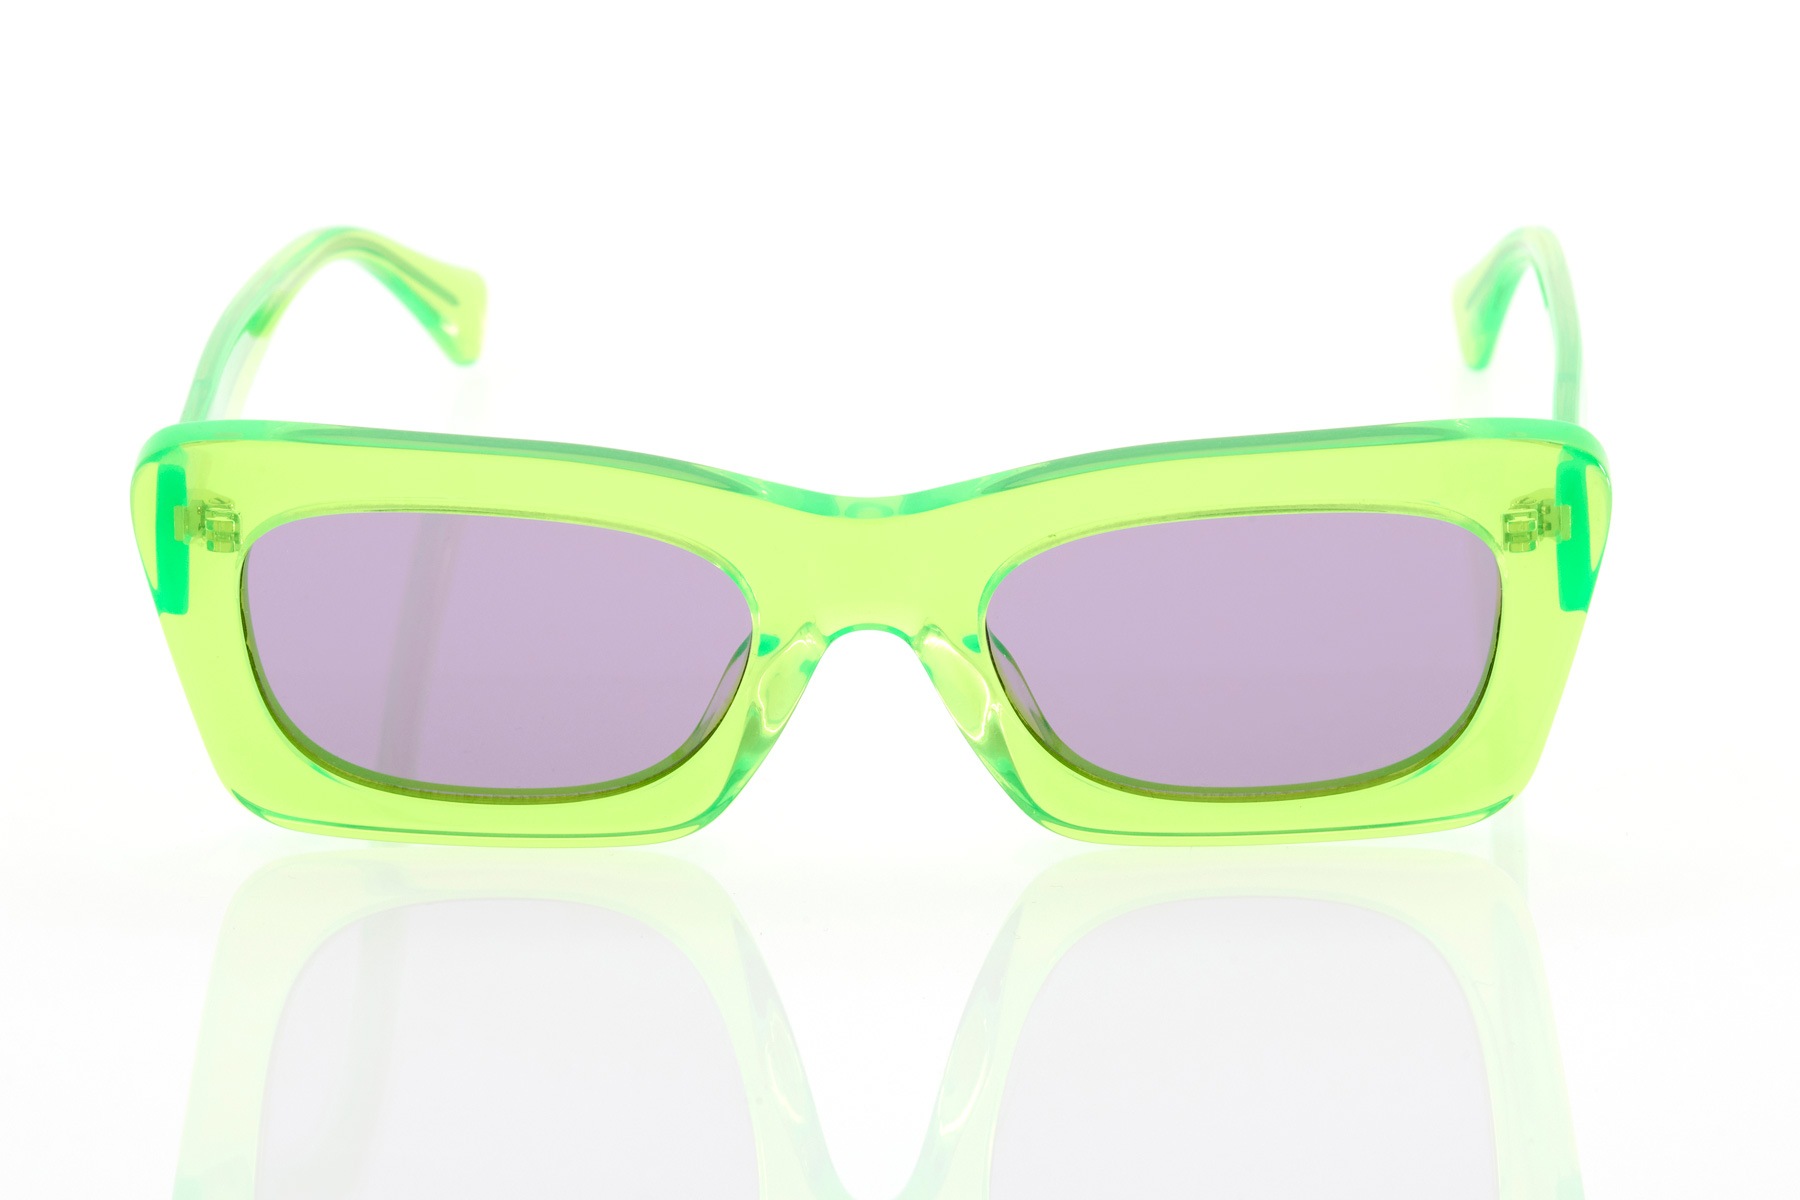 Unisex Lime Γυαλιά Ηλίου Hawkers Lauper Acid